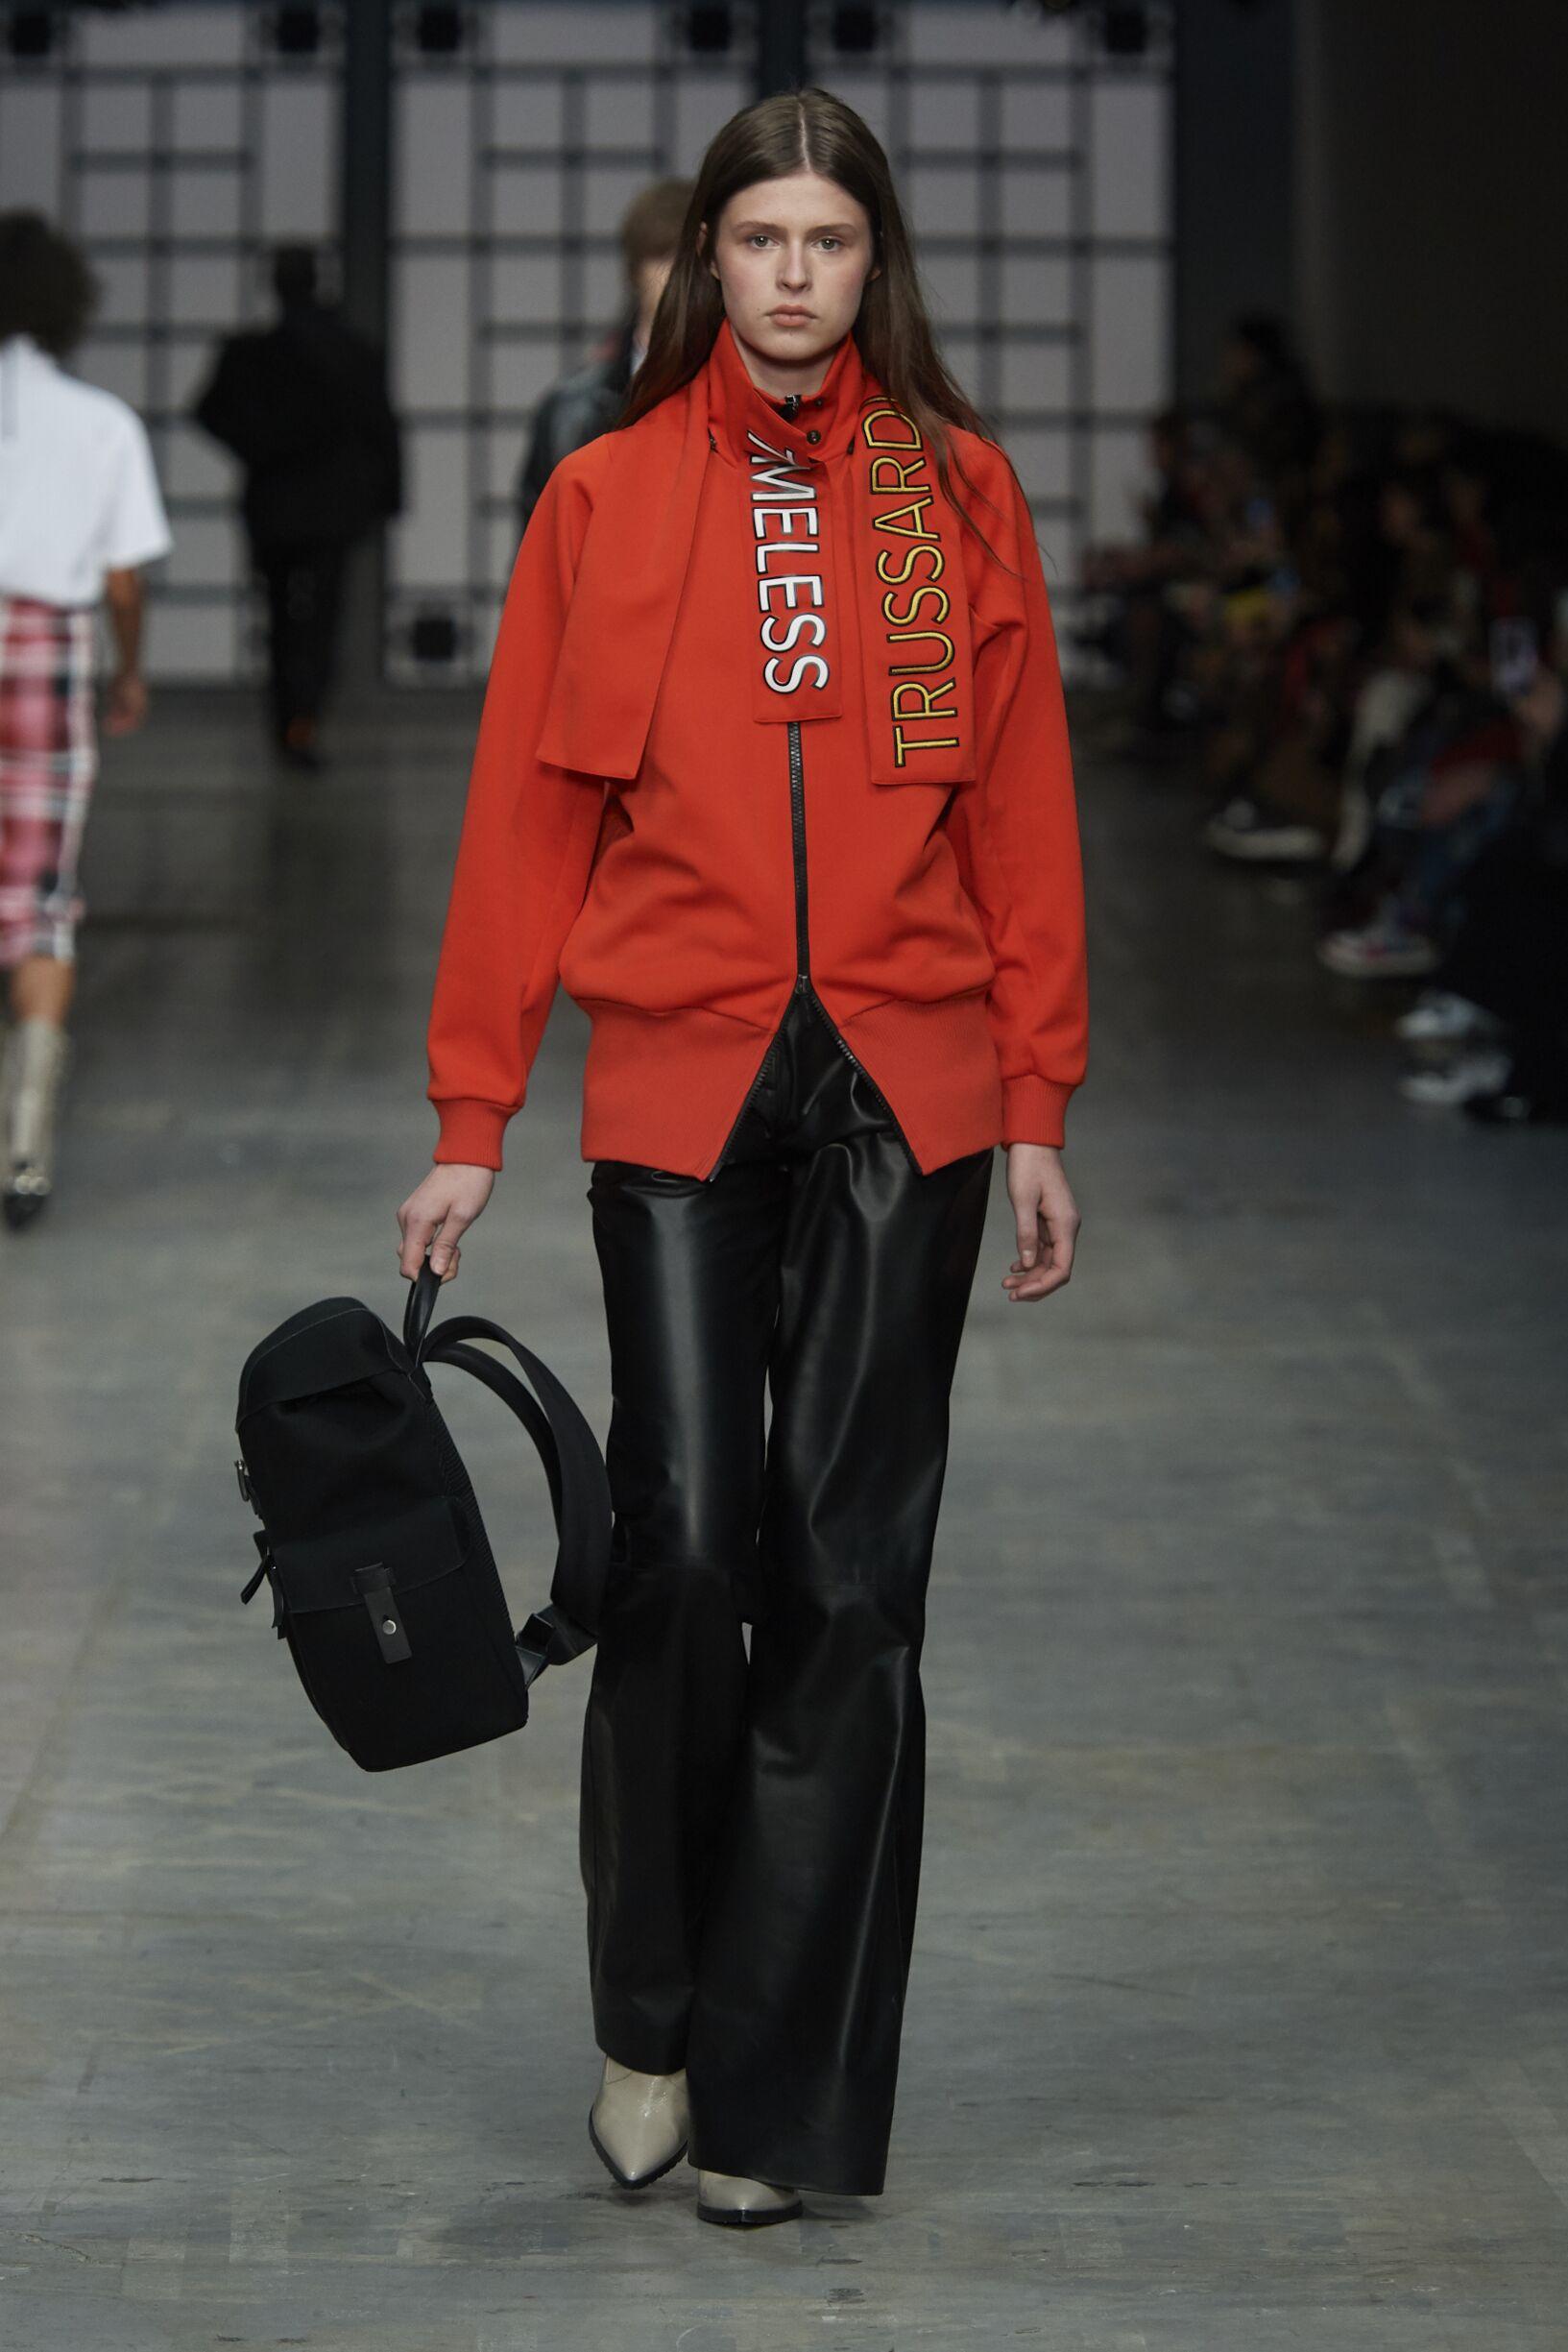 2018 Catwalk Trussardi Woman Fashion Show Winter